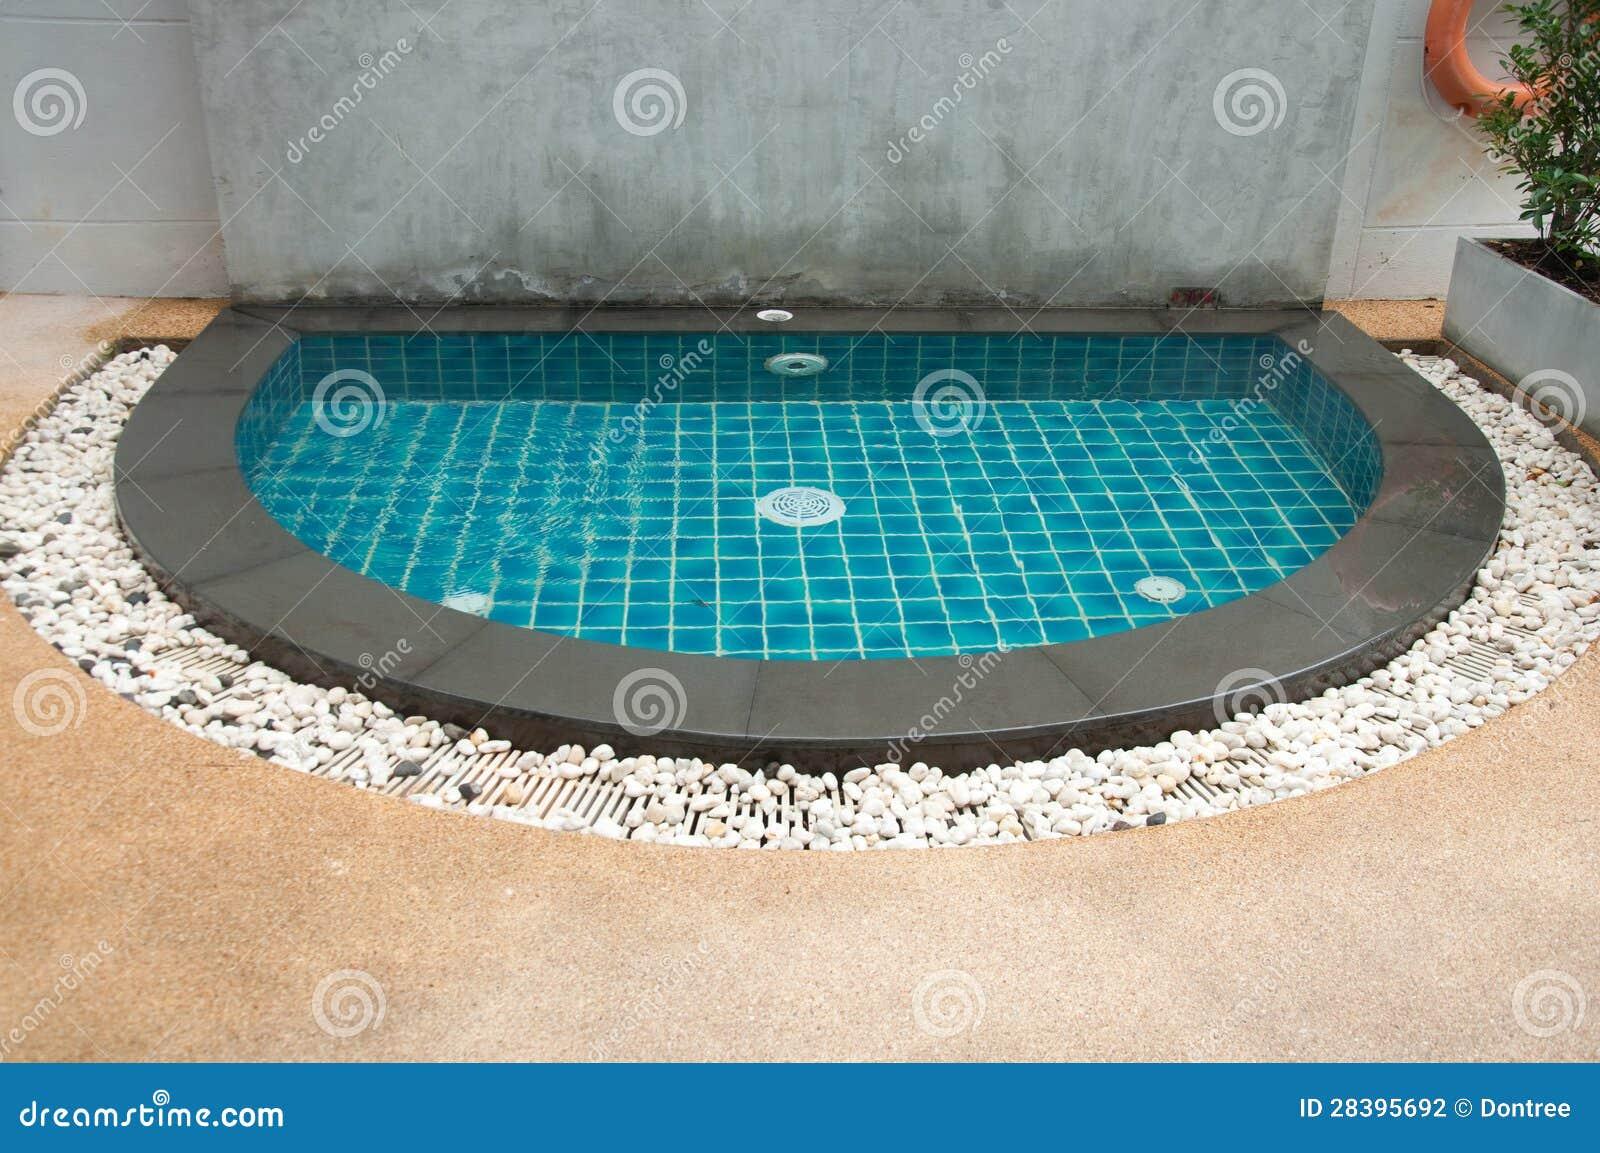 miniswimmingpool stockfoto. bild von mini, teich, relax - 28395692